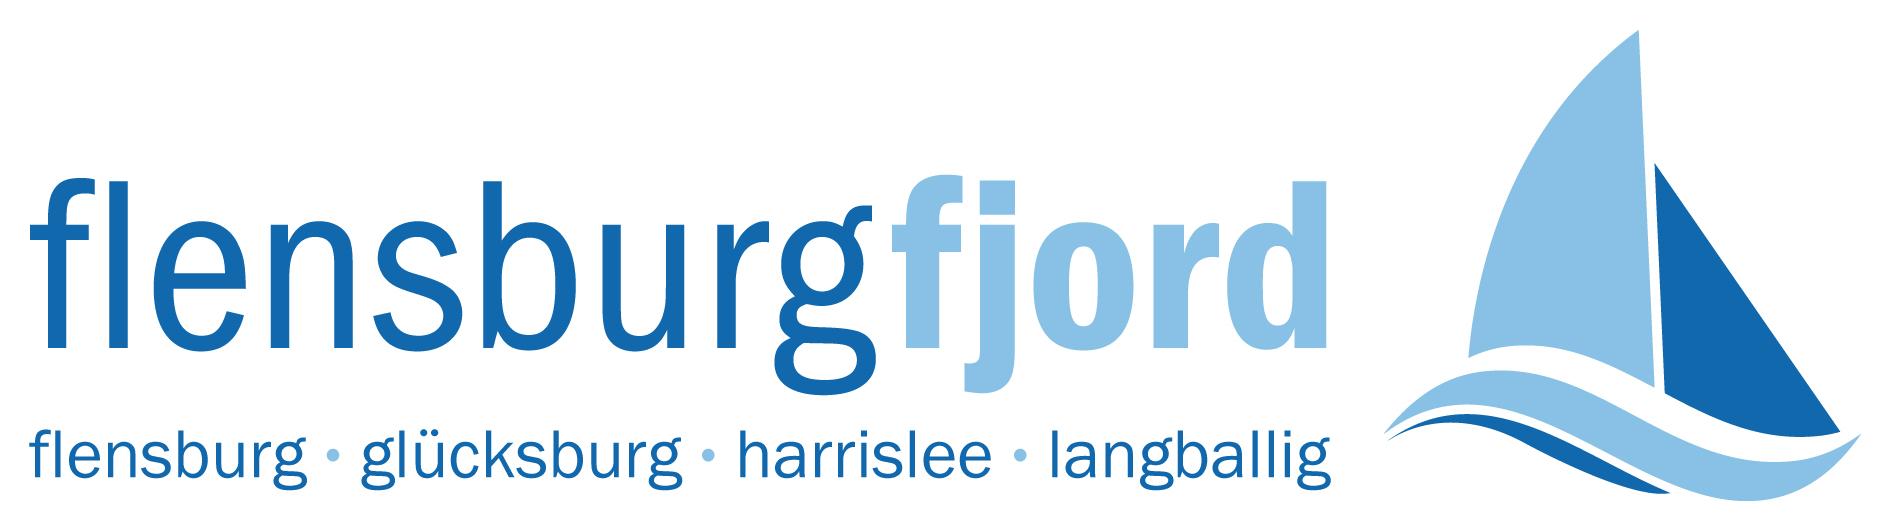 1354041269_logo-flensburg